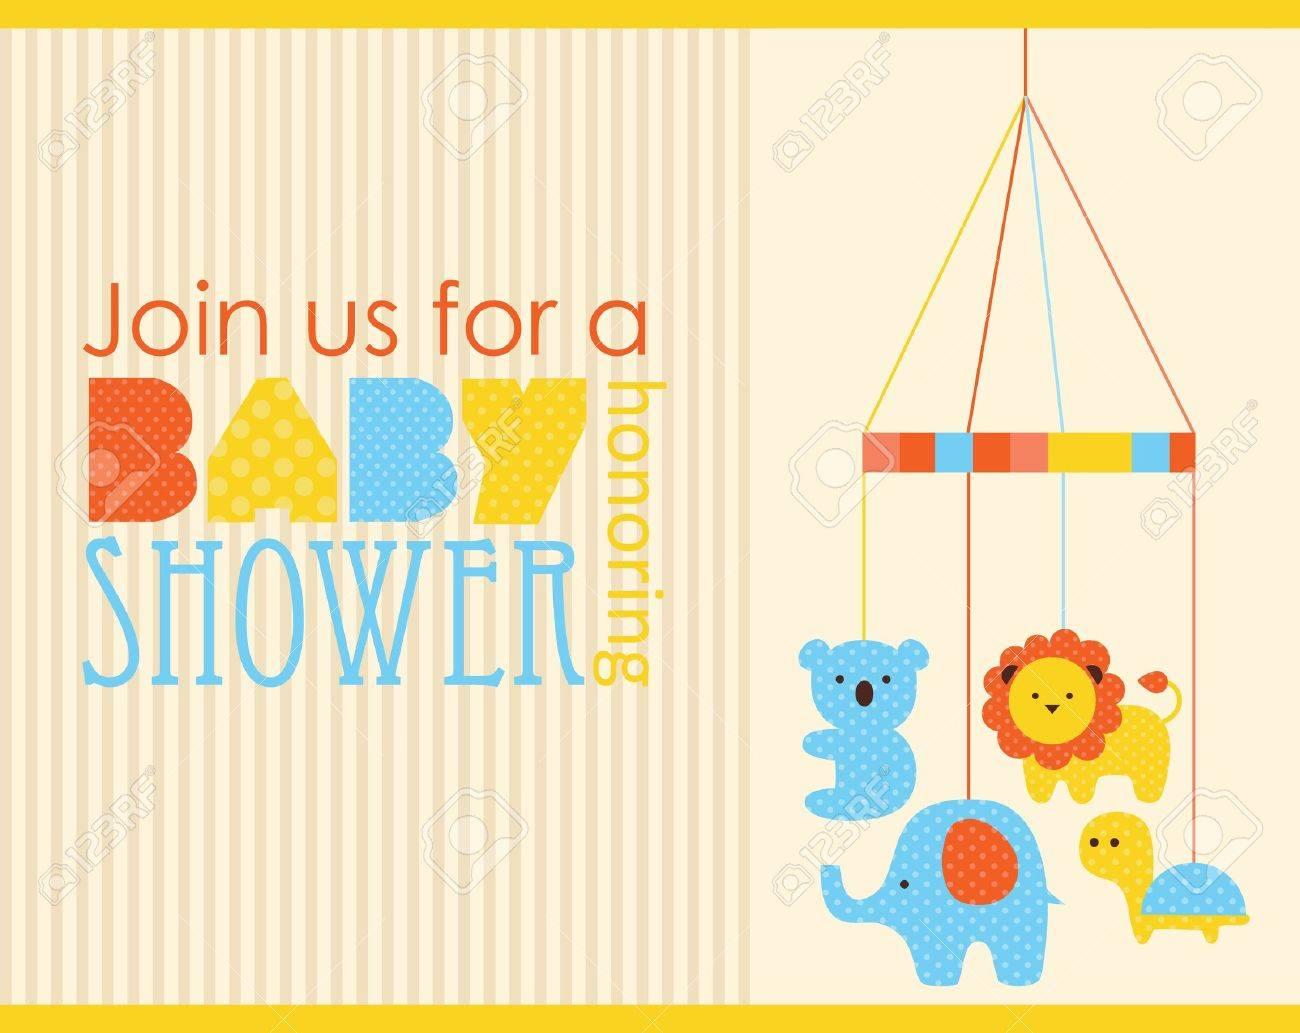 baby shower card design. vector illustration - 20562870